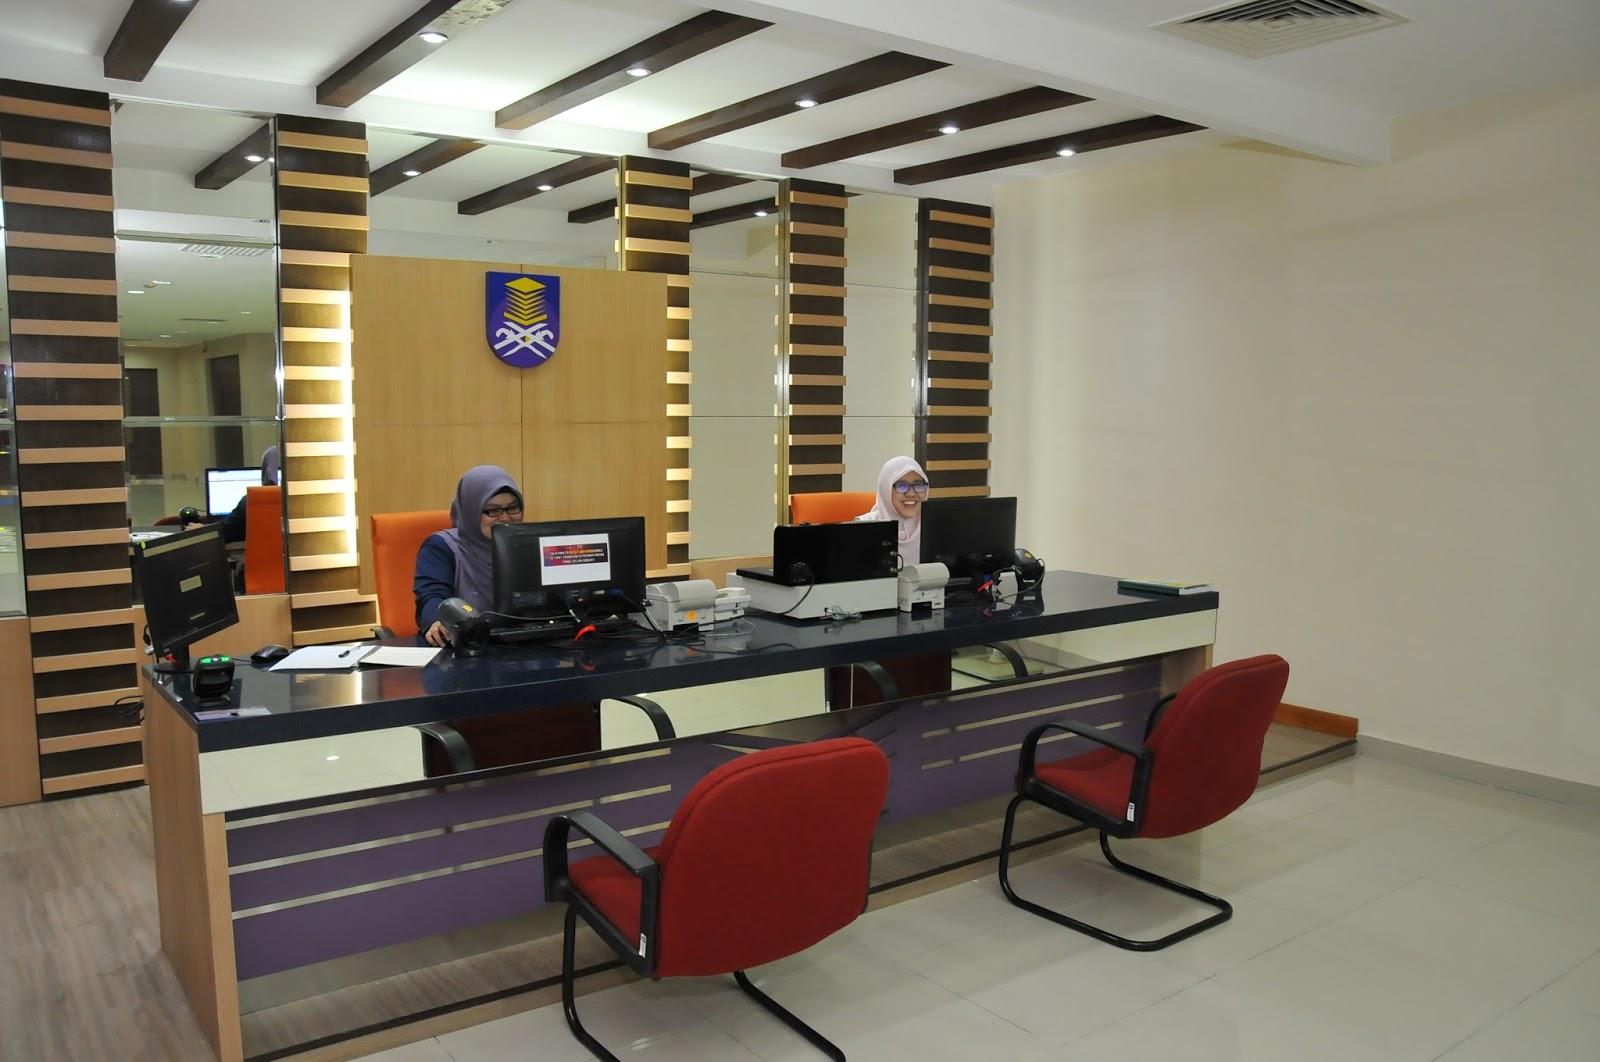 Gambar Perpustakaan Tun Abdul Razak Utama Aras 2 Perpustakaan Uitm